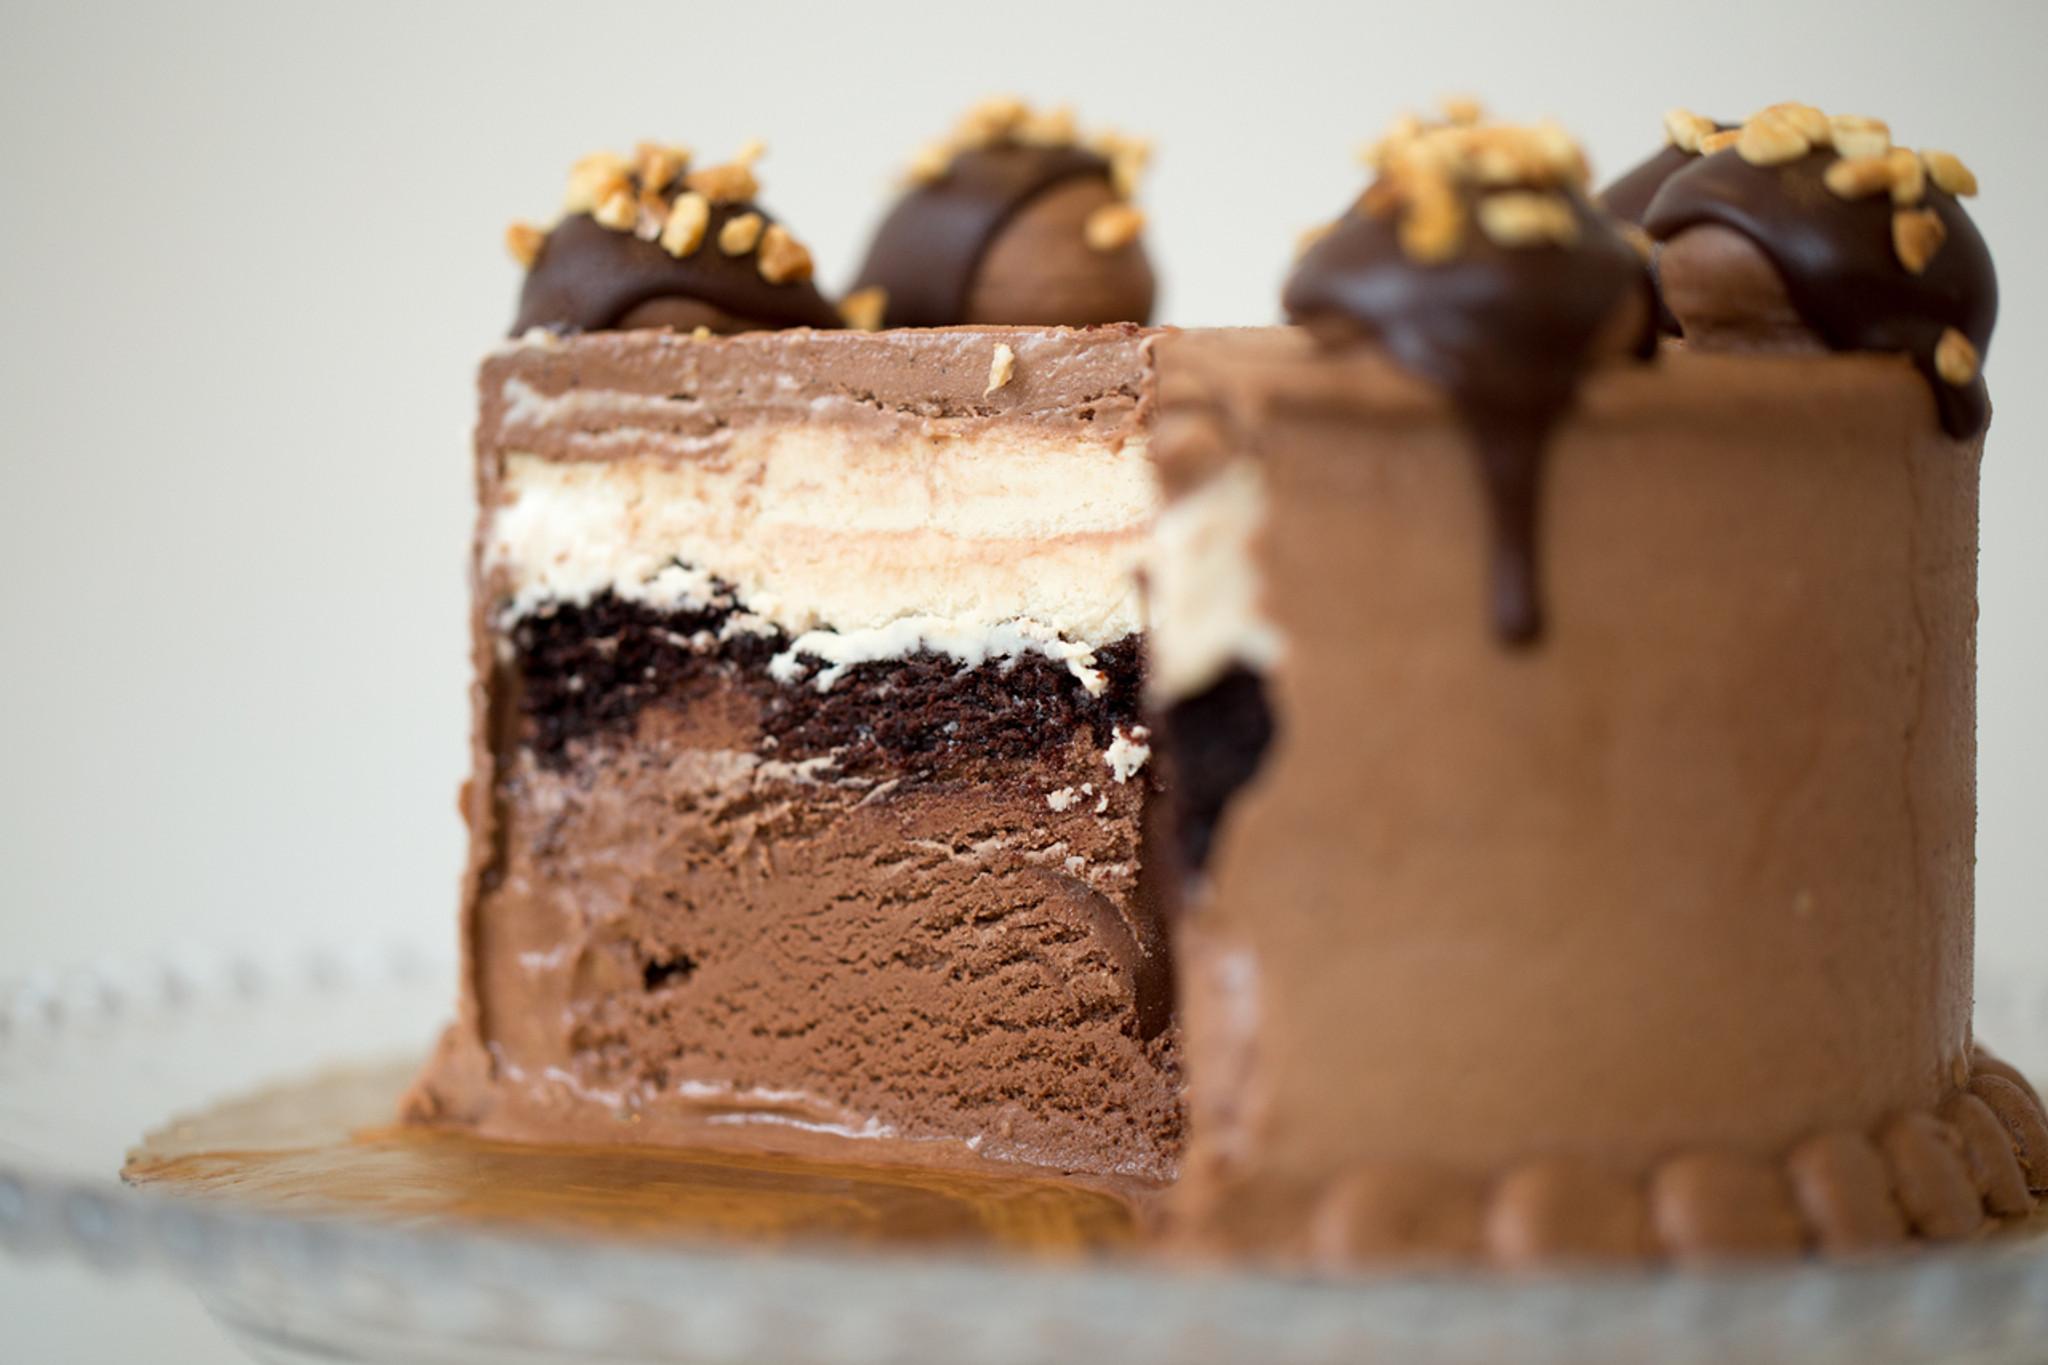 Google Images Ice Cream Cake : Custom Ice Cream Cake - FoMu Ice Cream